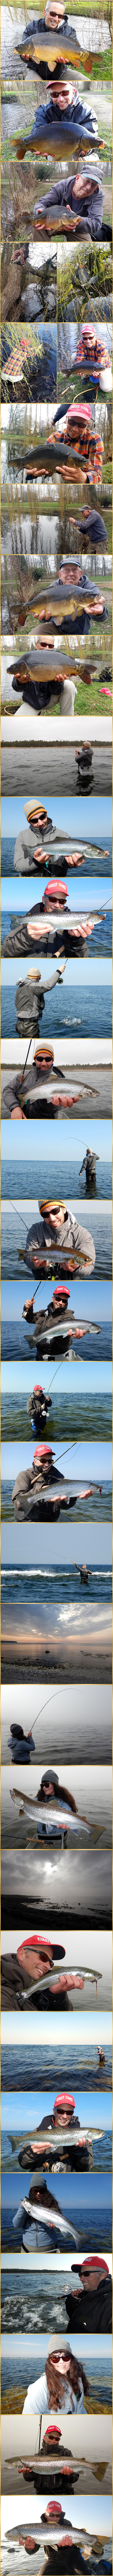 Gotland Sea trout